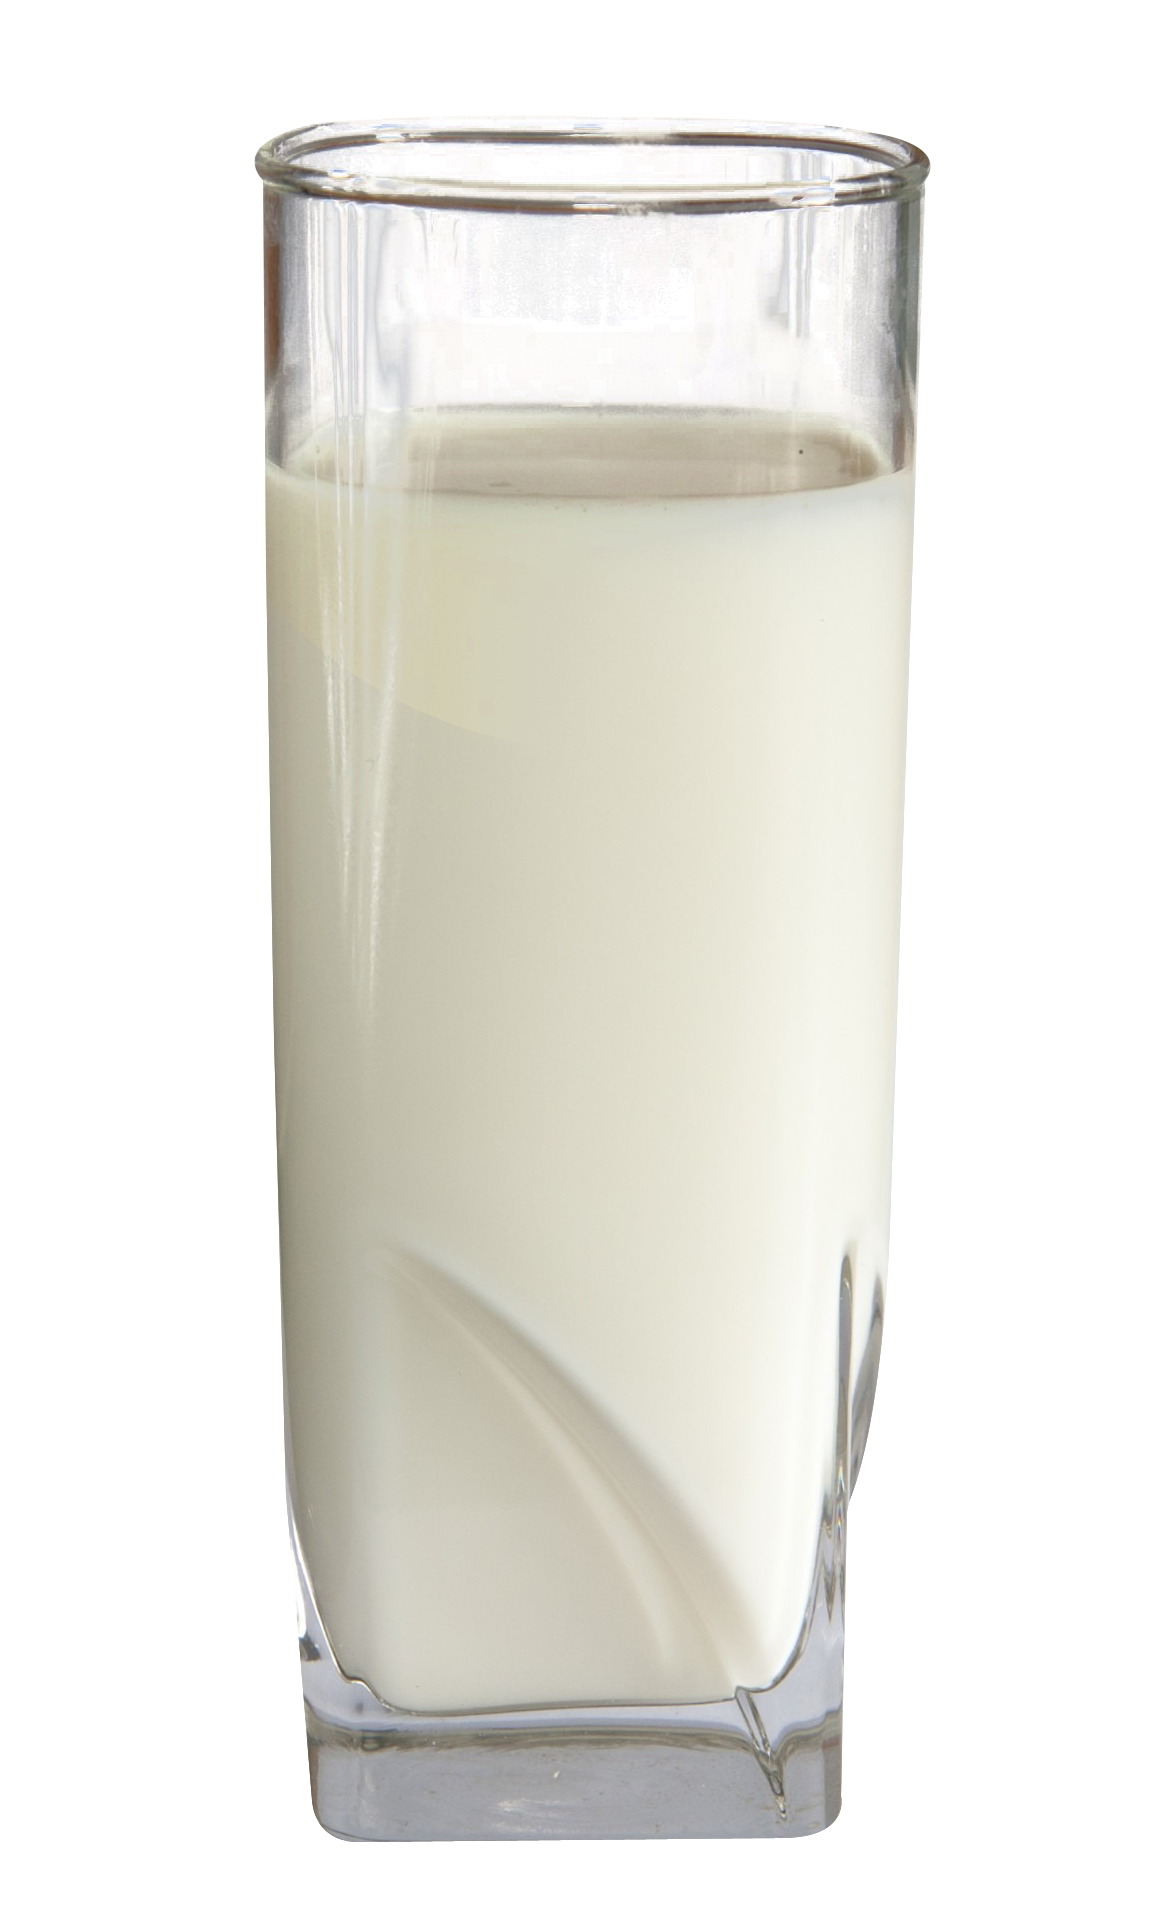 Fresh Milk In A Glass Design Element Free Image By Rawpixel Com Teddy Rawpixel Glass Design Glass Fresh Milk